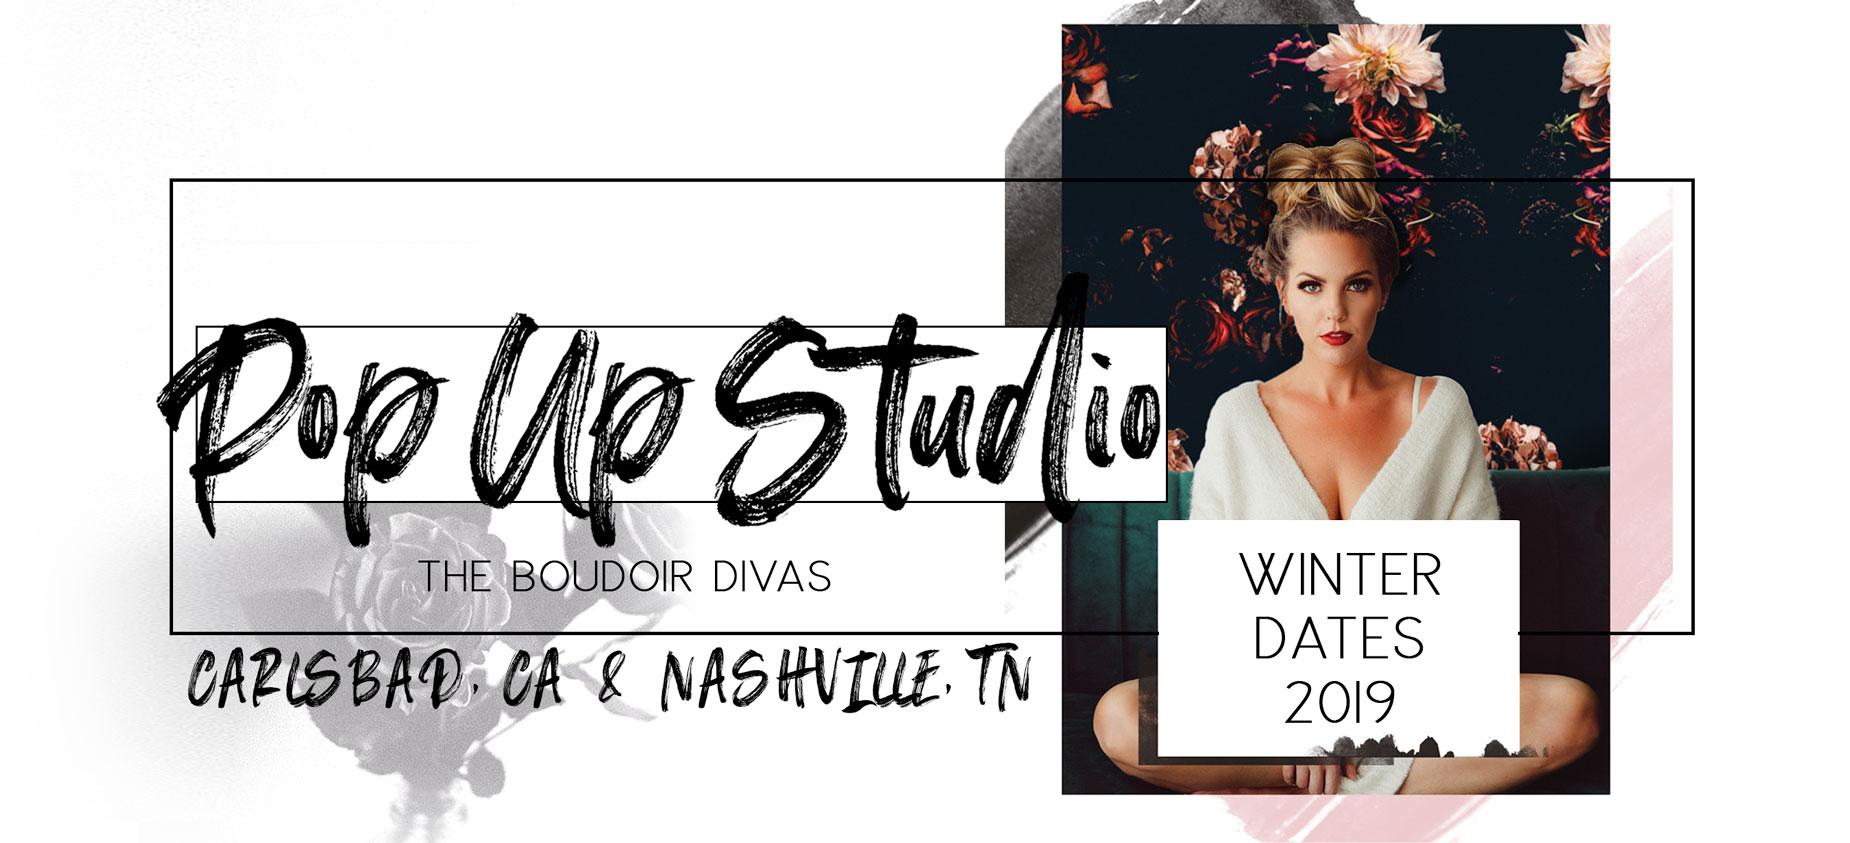 00-header-boudoir-divas-pop-up-studio-nashville-web.jpg